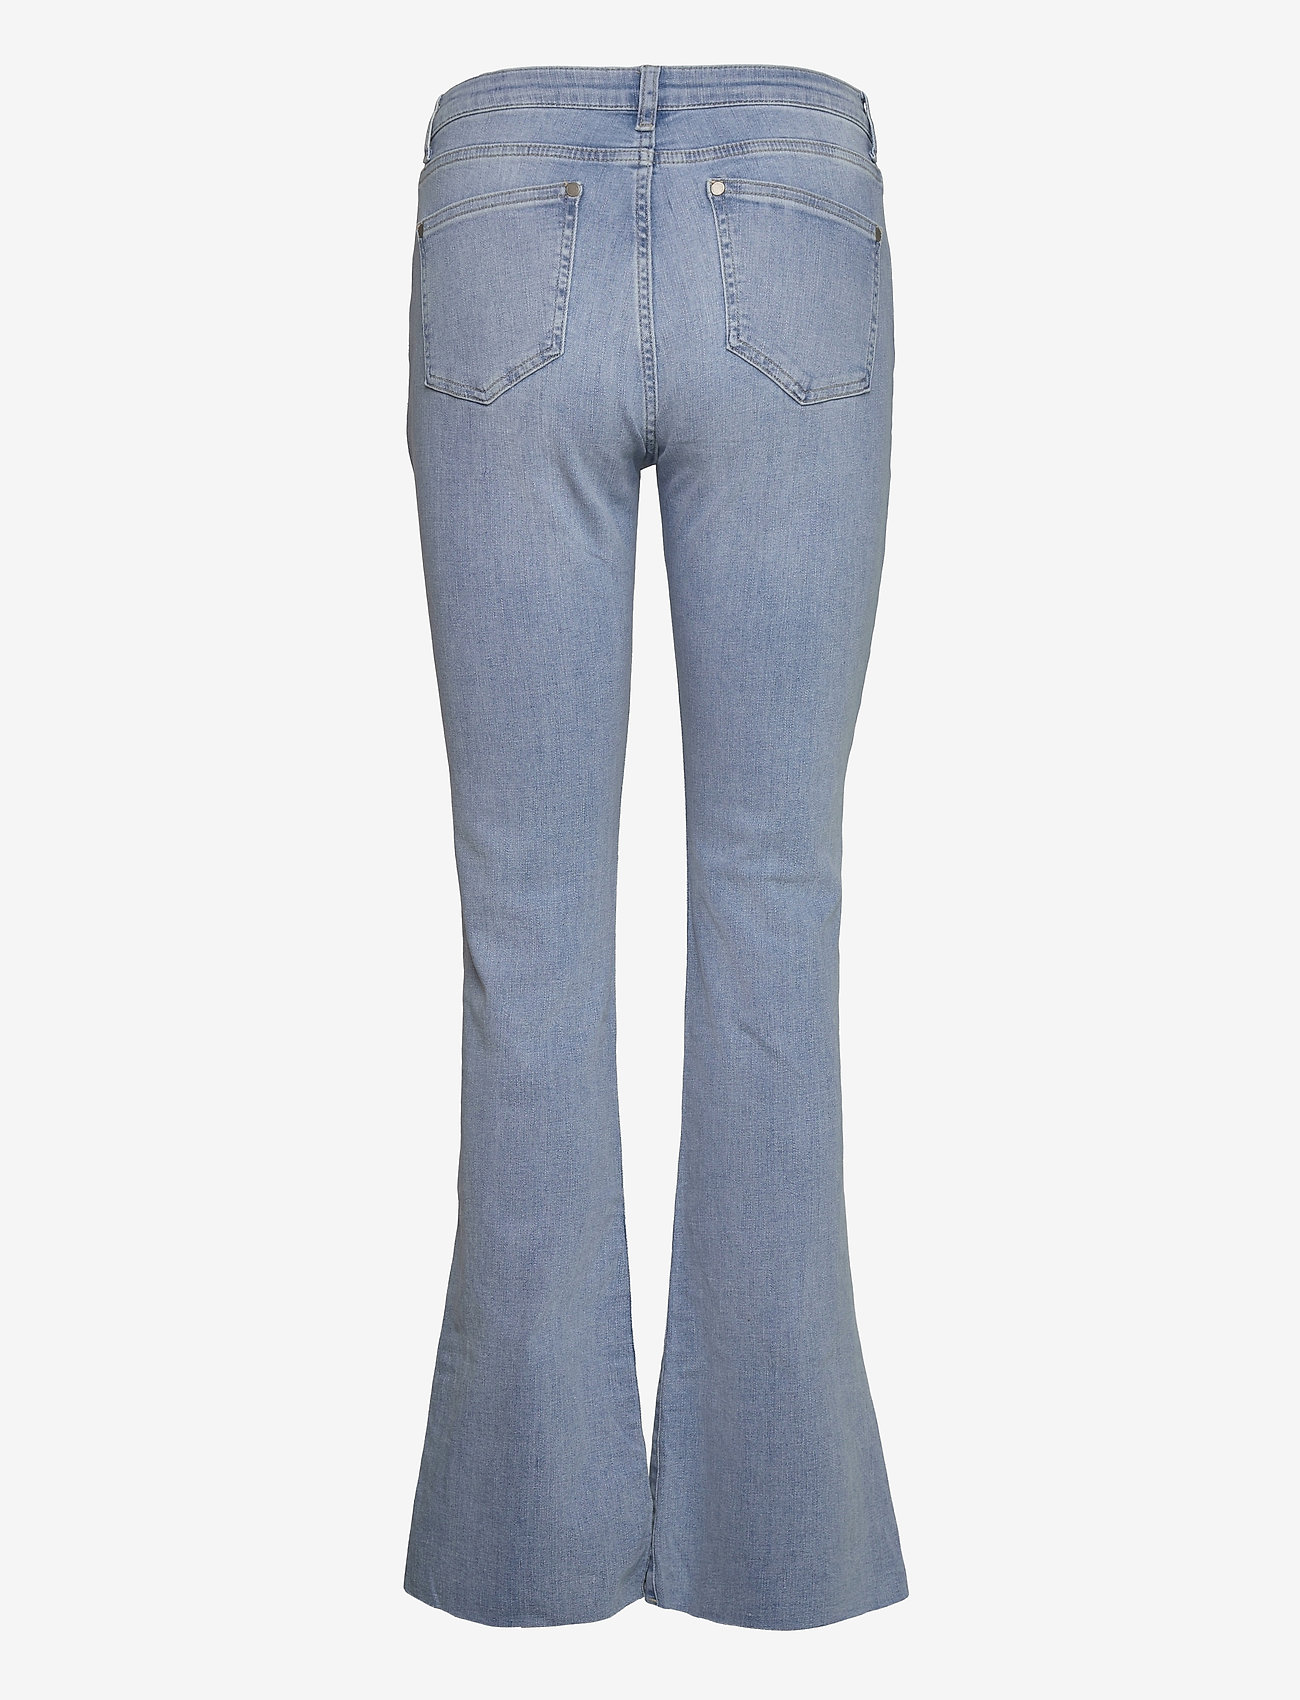 Minus - New enzo jeans - schlaghosen - light denim - 1